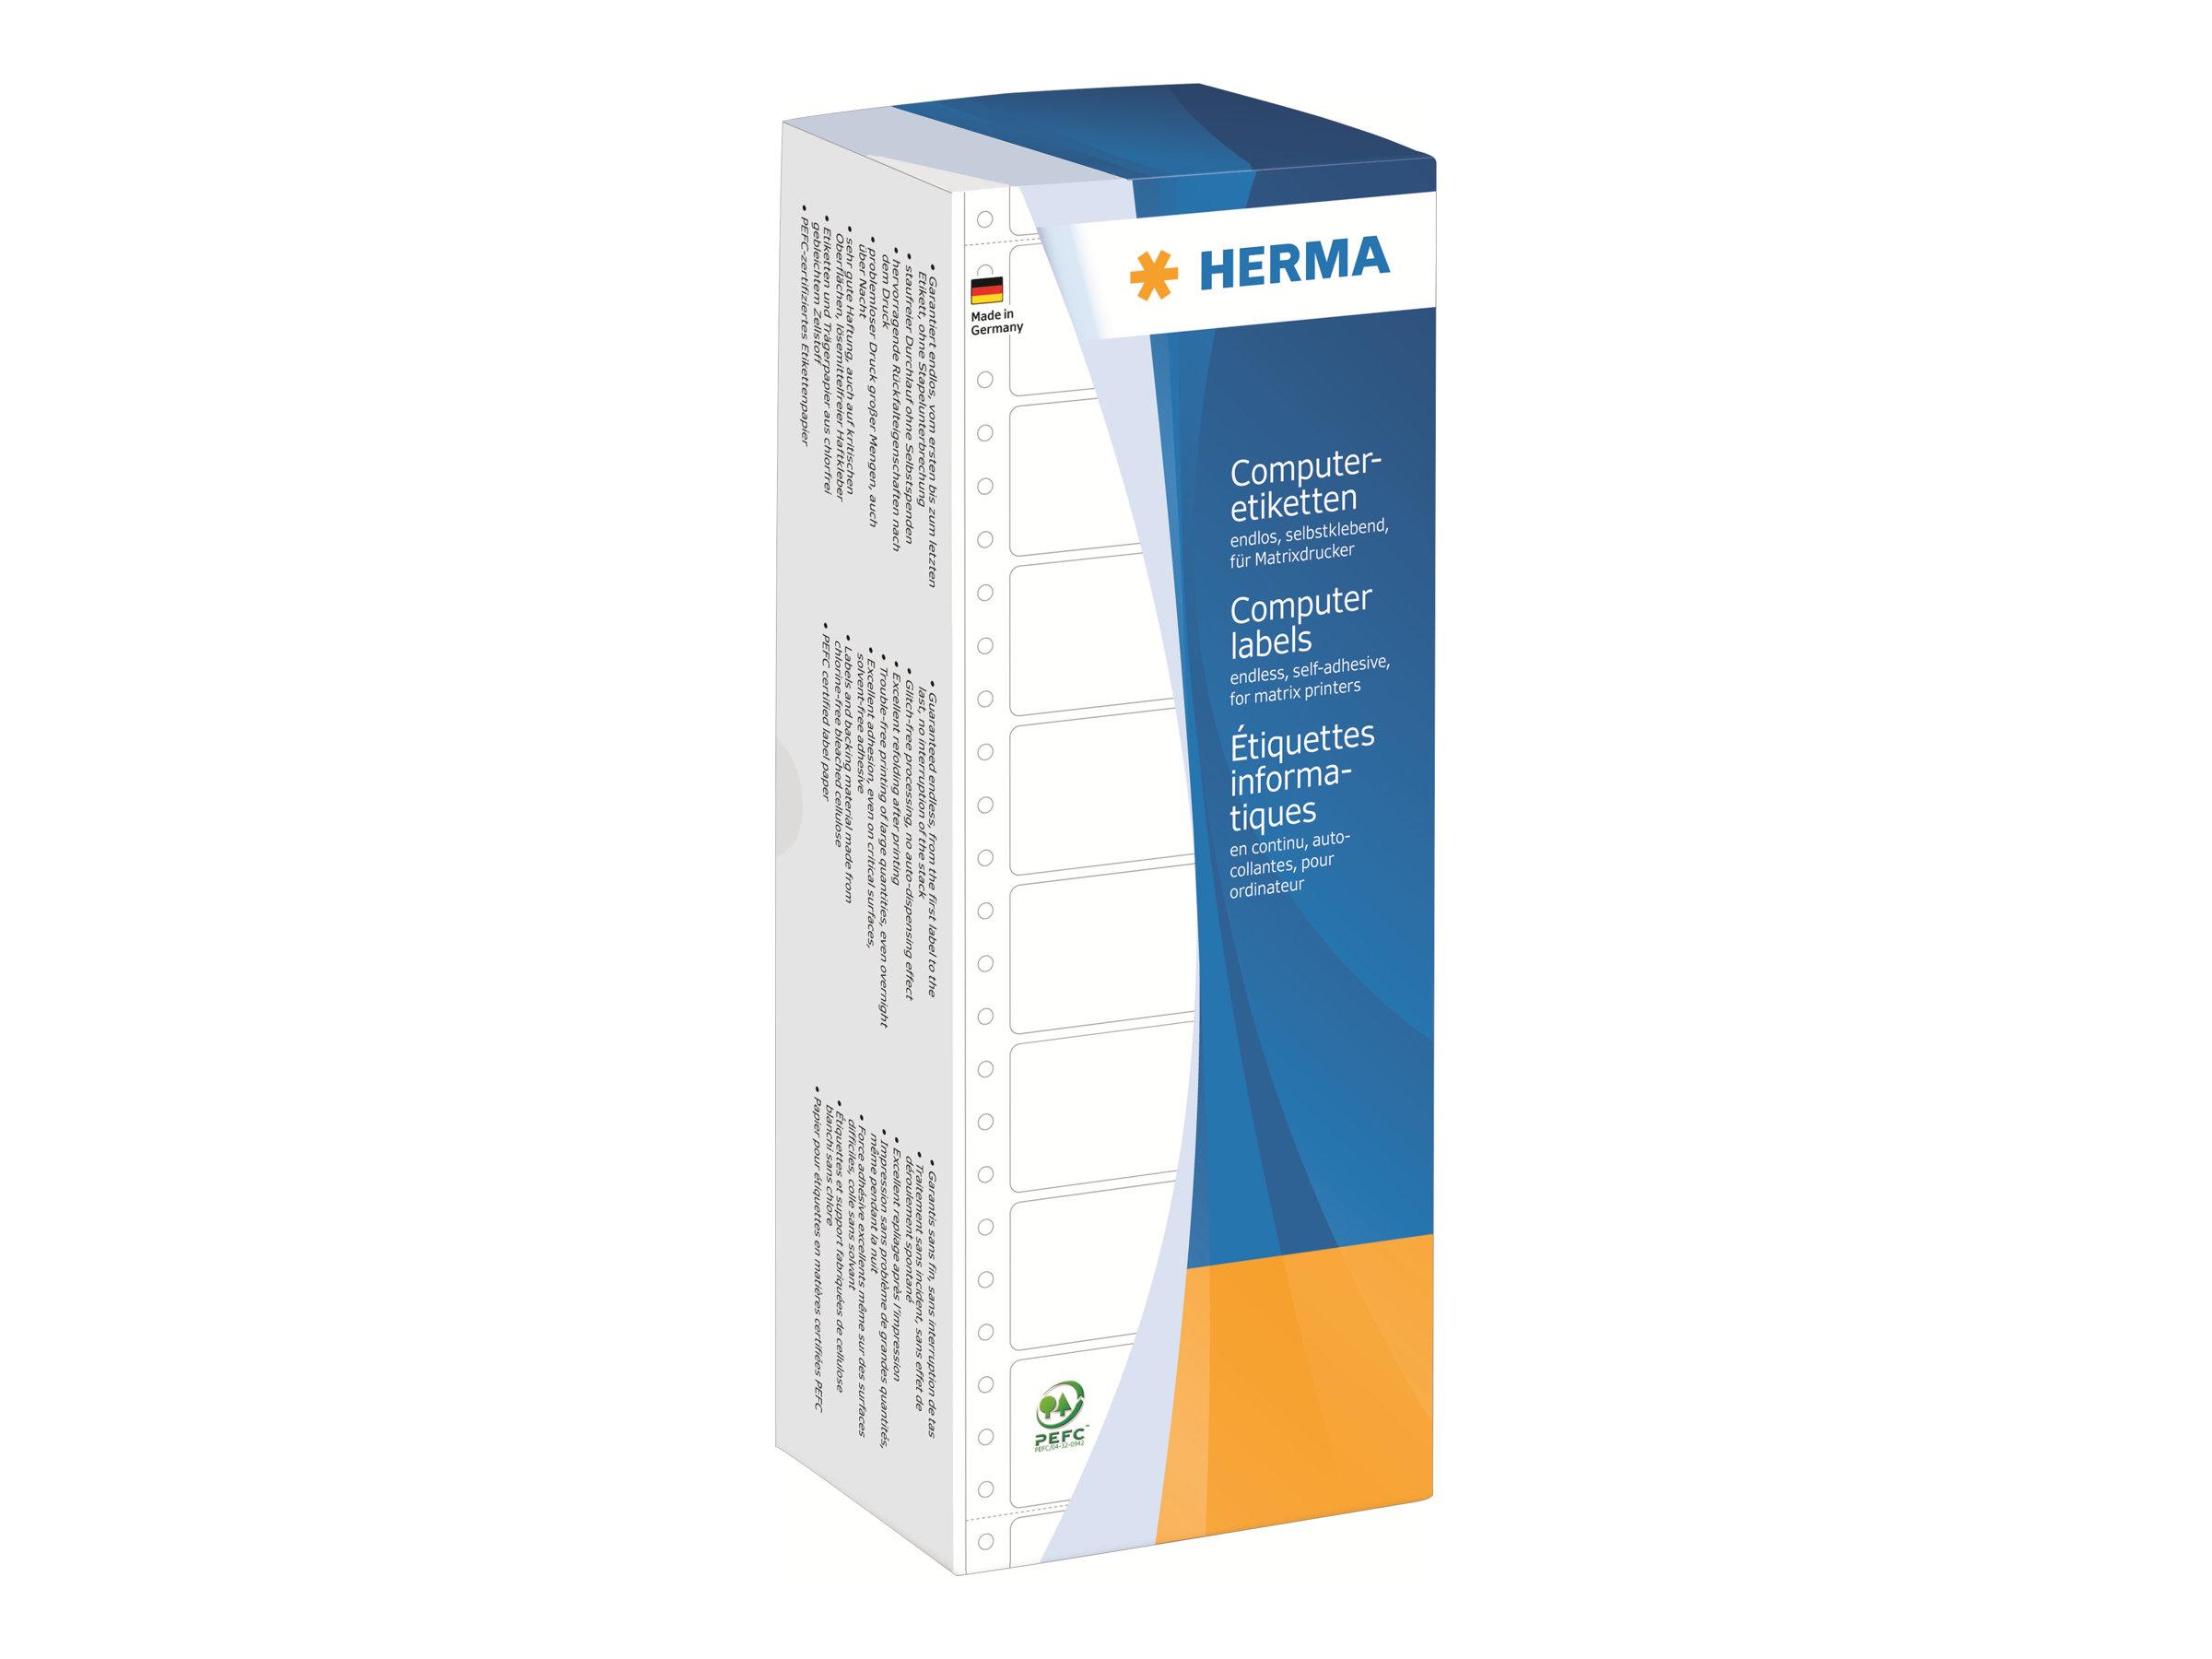 HERMA Computer labels - Papier - matt - permanent selbstklebend